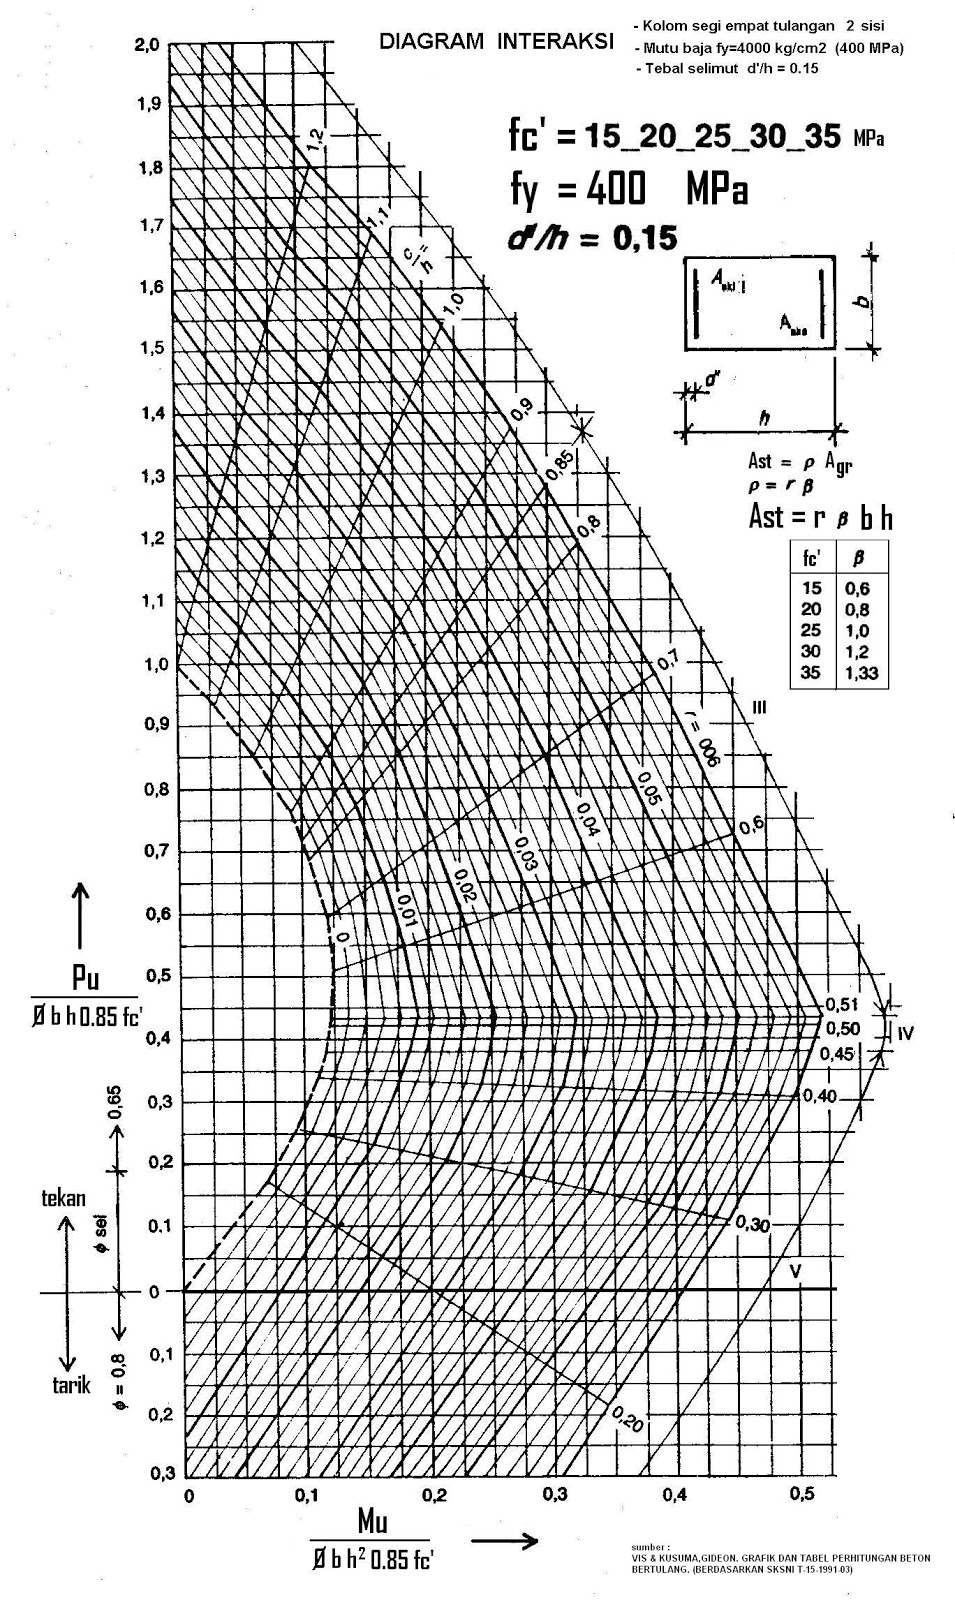 Struktur beton 1 grafik perencanaan kolom persegi diagram interaksi kolom persegi tulangan pada 2 sisi ccuart Choice Image